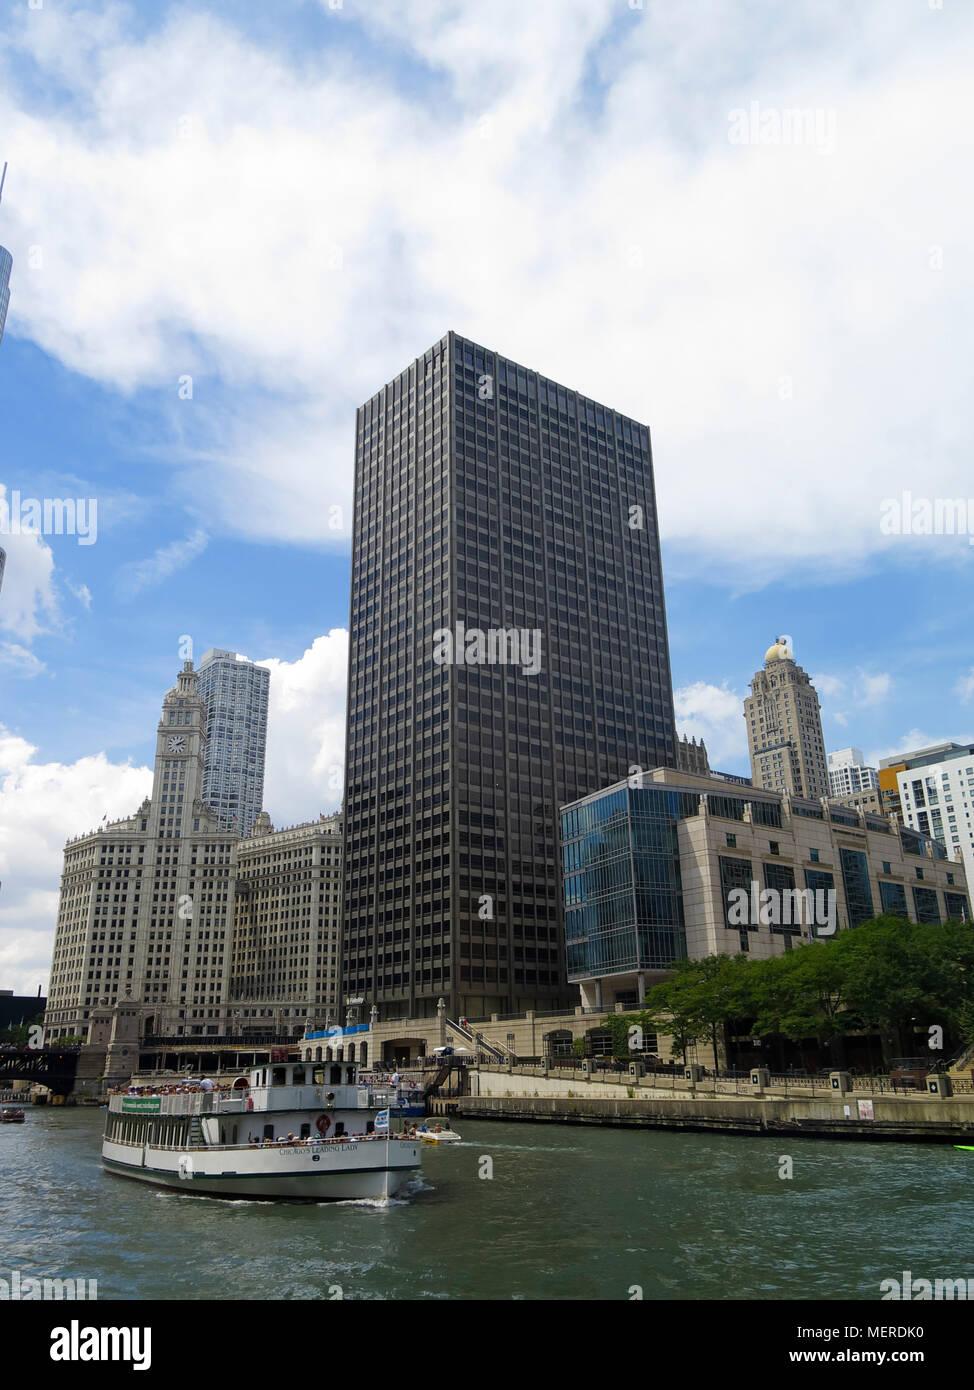 Tourist cruise ship on Chicago river, Chicago, Illinois, USA - Stock Image